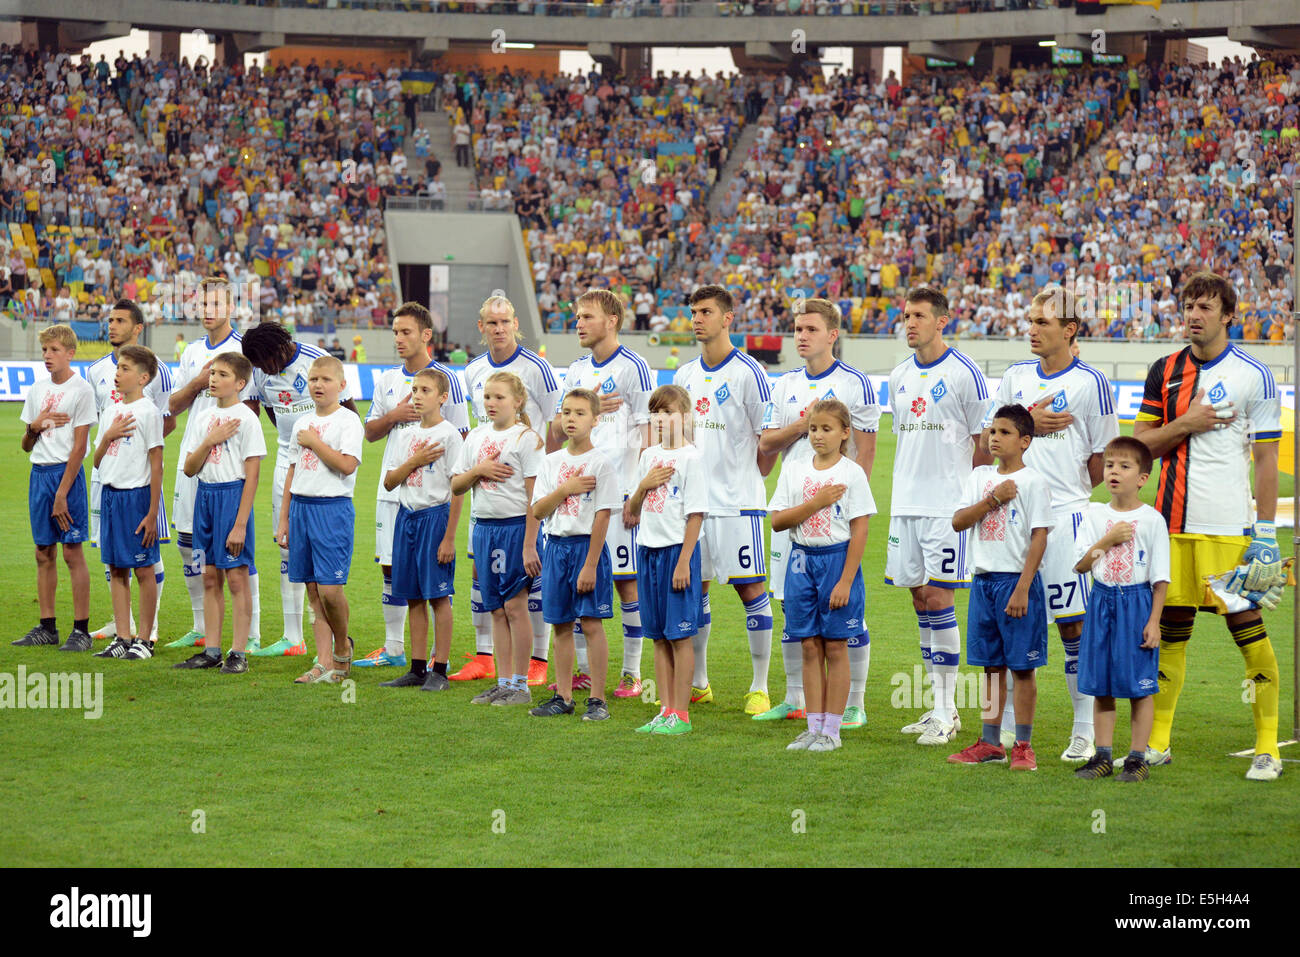 Dinamo football team during the match Inter between 'Shakhtar' (Donetsk City) and Dynamo (Kyiv) at Stadium - Stock Image